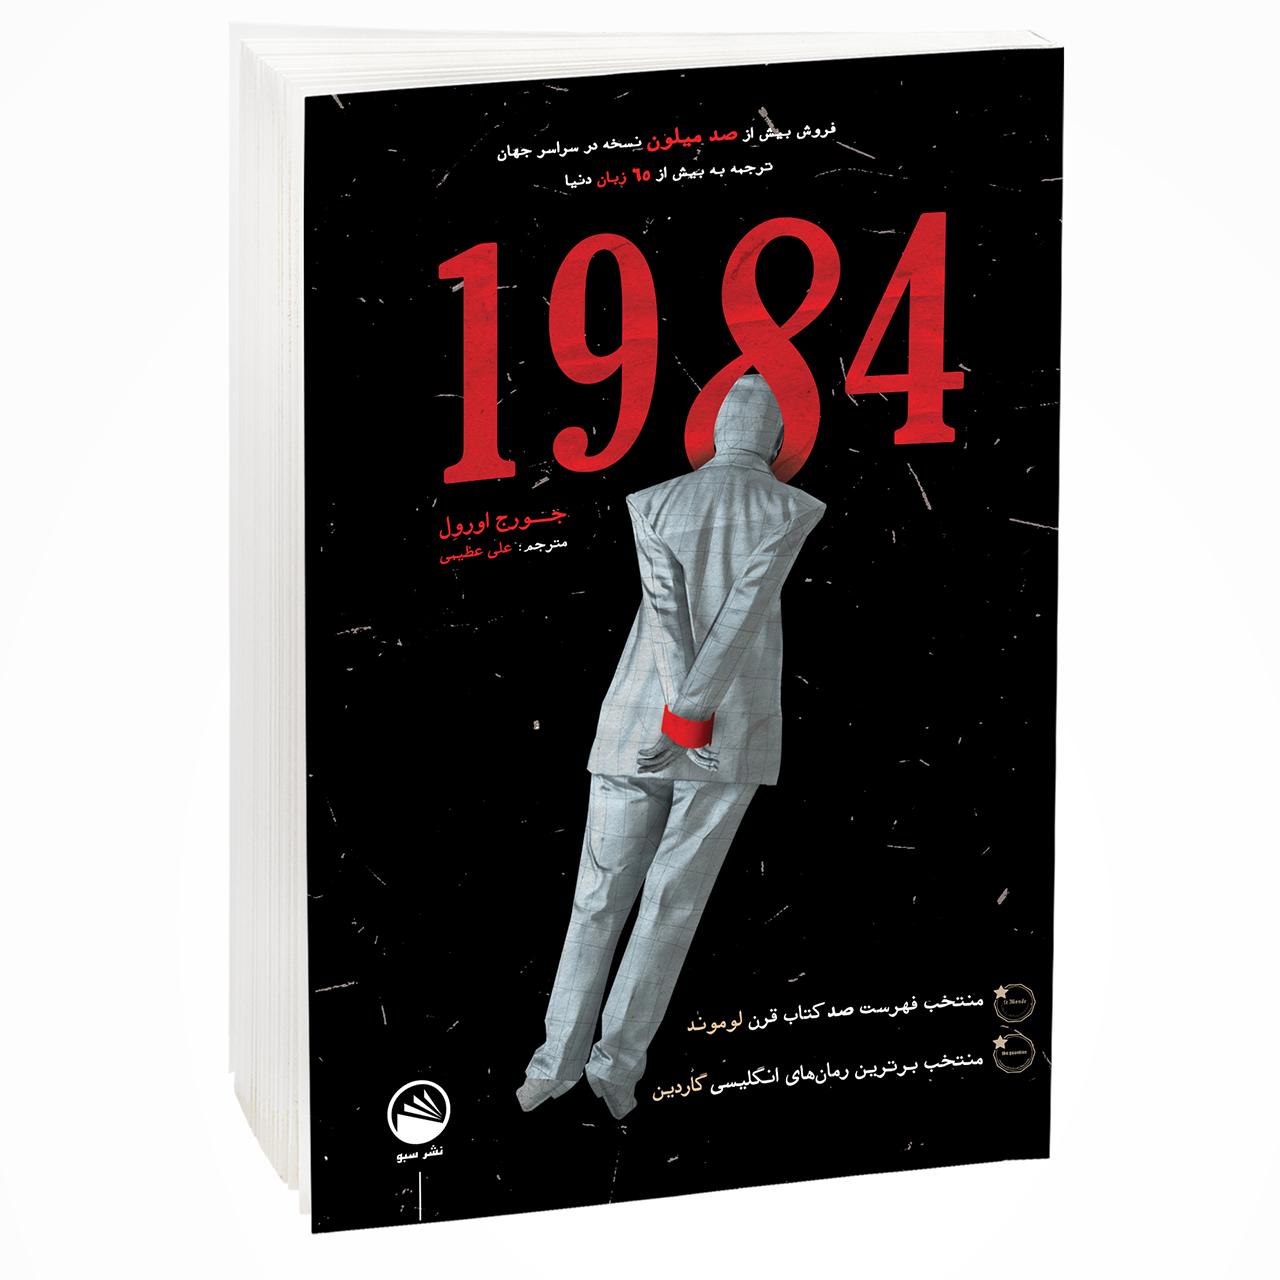 کتاب 1984 اثر جورج اورول نشر سبو